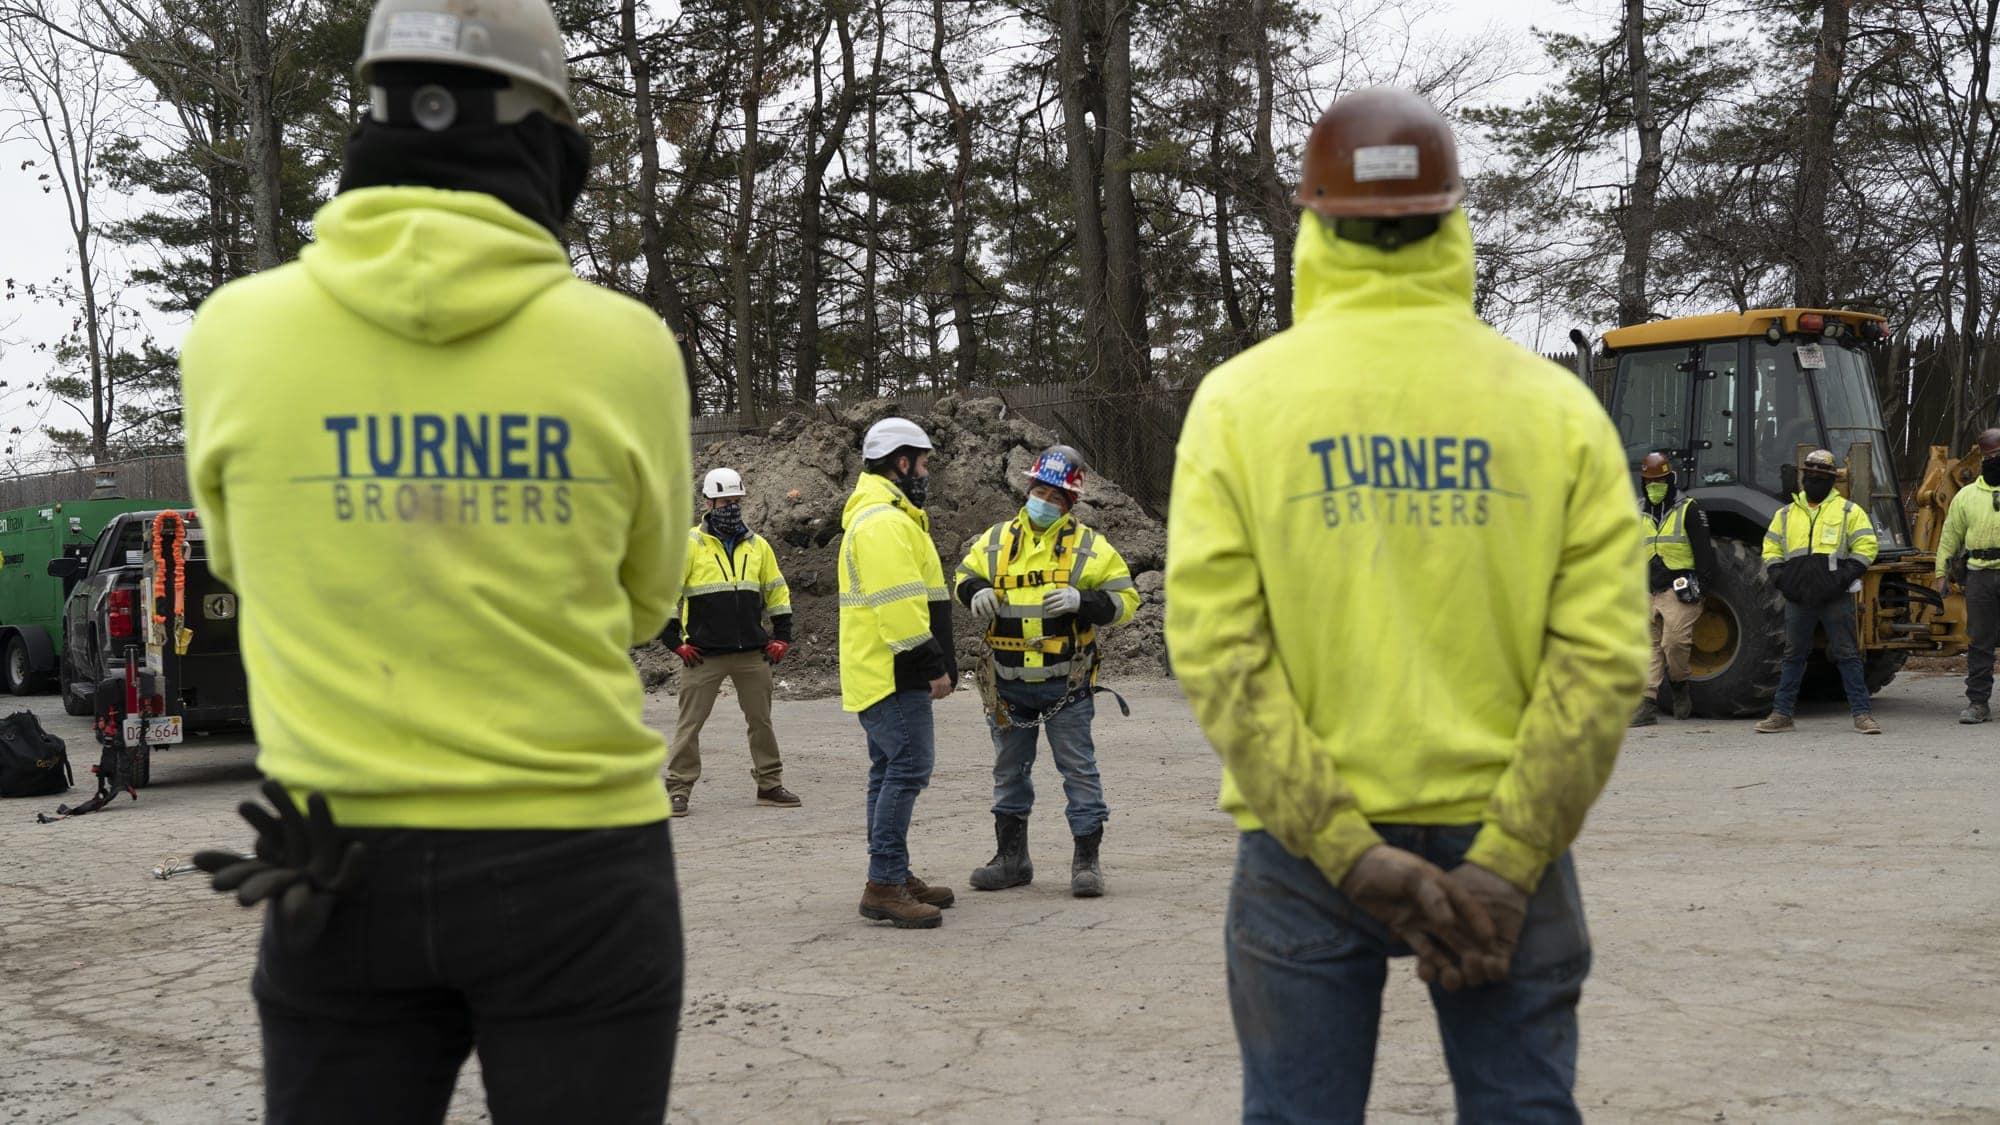 Turner Brothers Employee Meeting